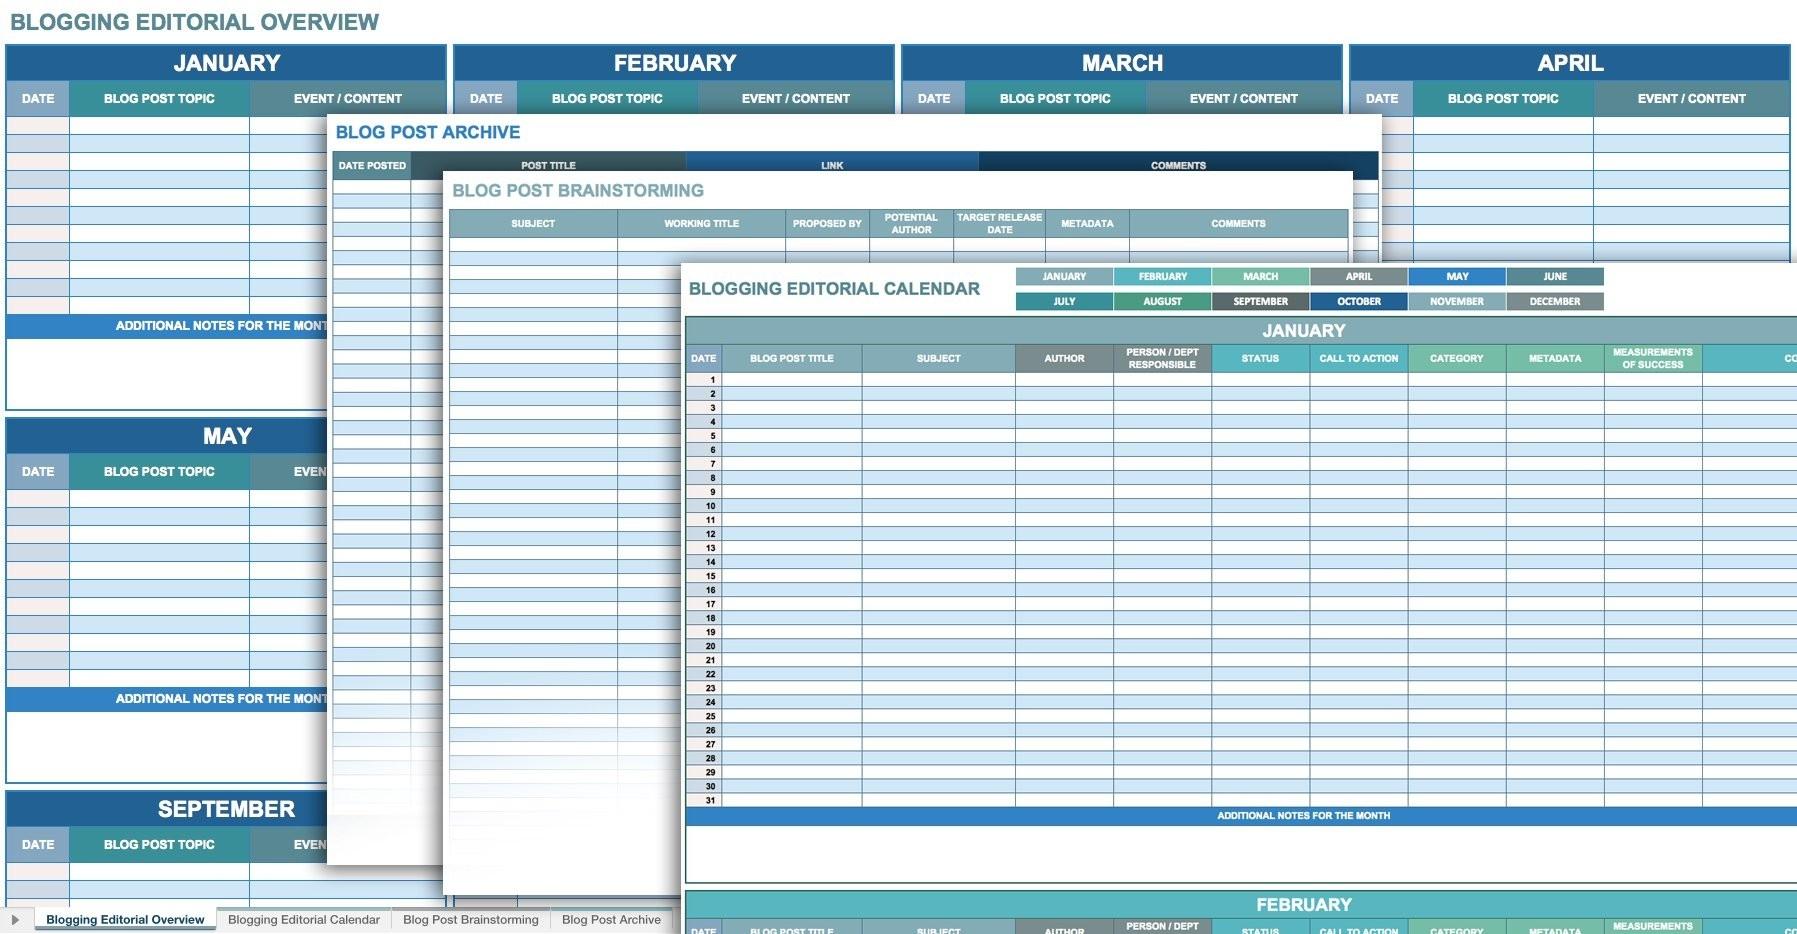 12 Free Social Media Templates | Smartsheet-Social Media Posting Calendar Template